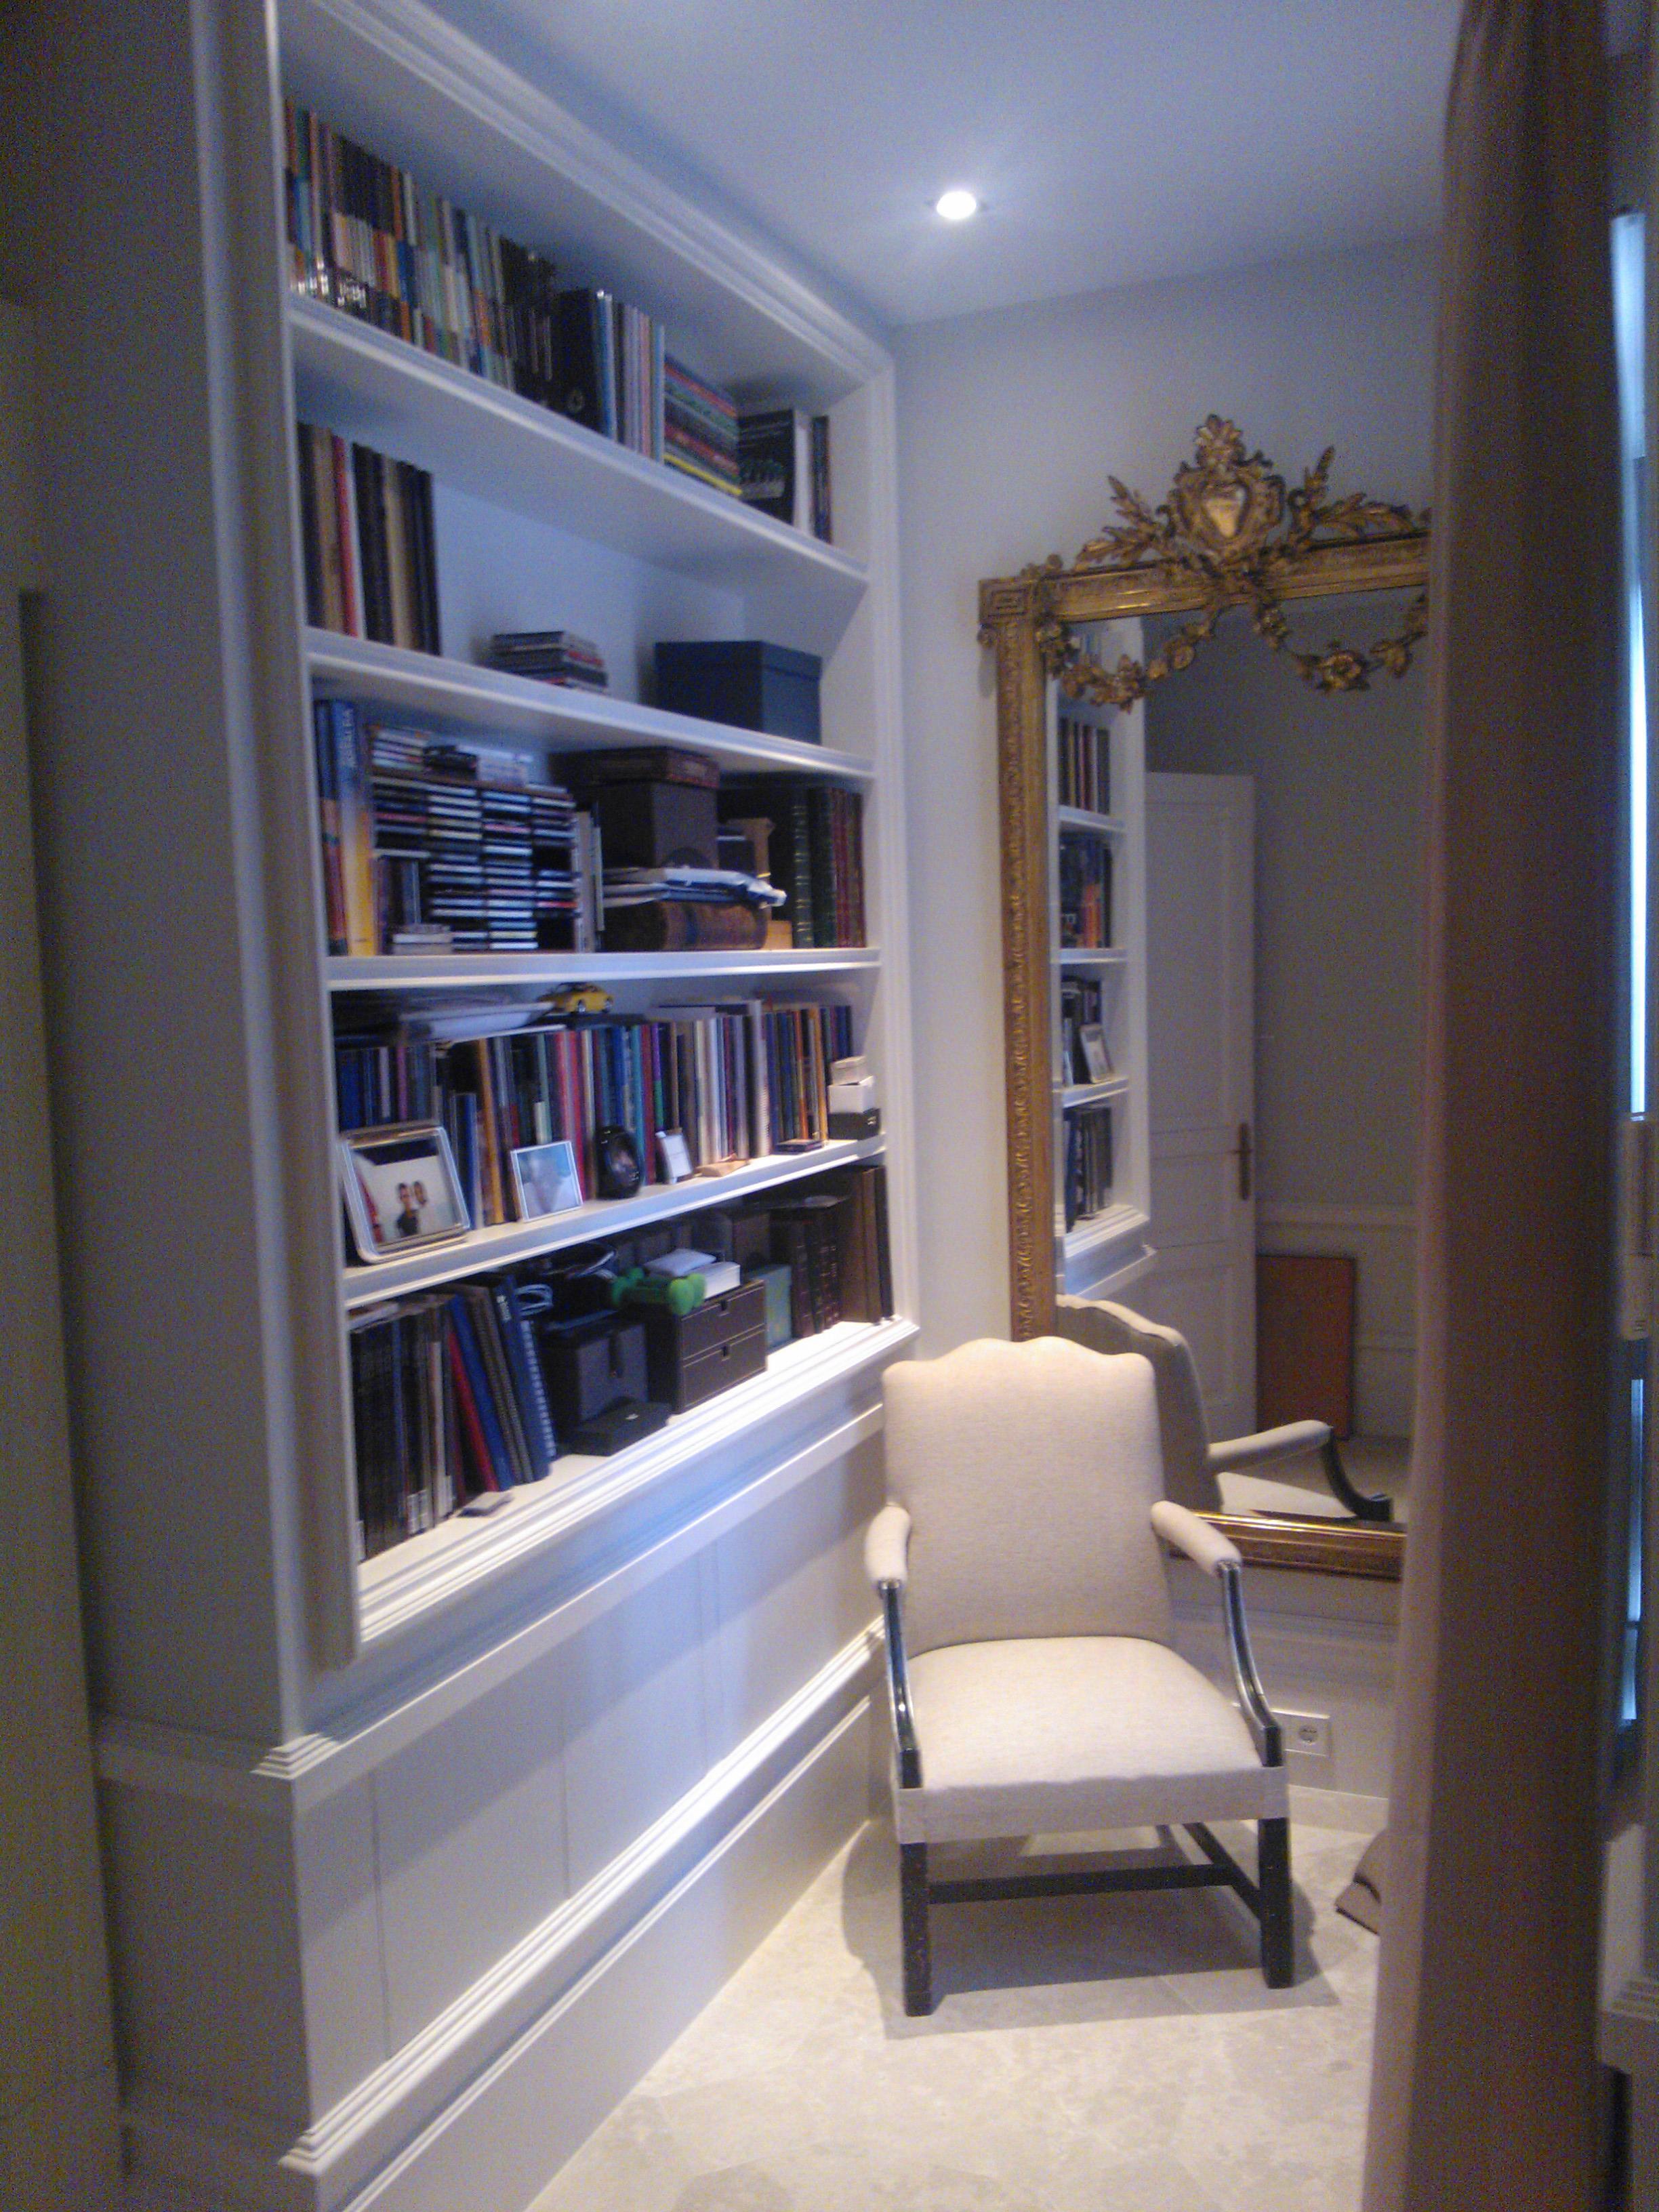 Decoradores de interiores en madrid fabulous pintores - Decoradores de interiores en madrid ...